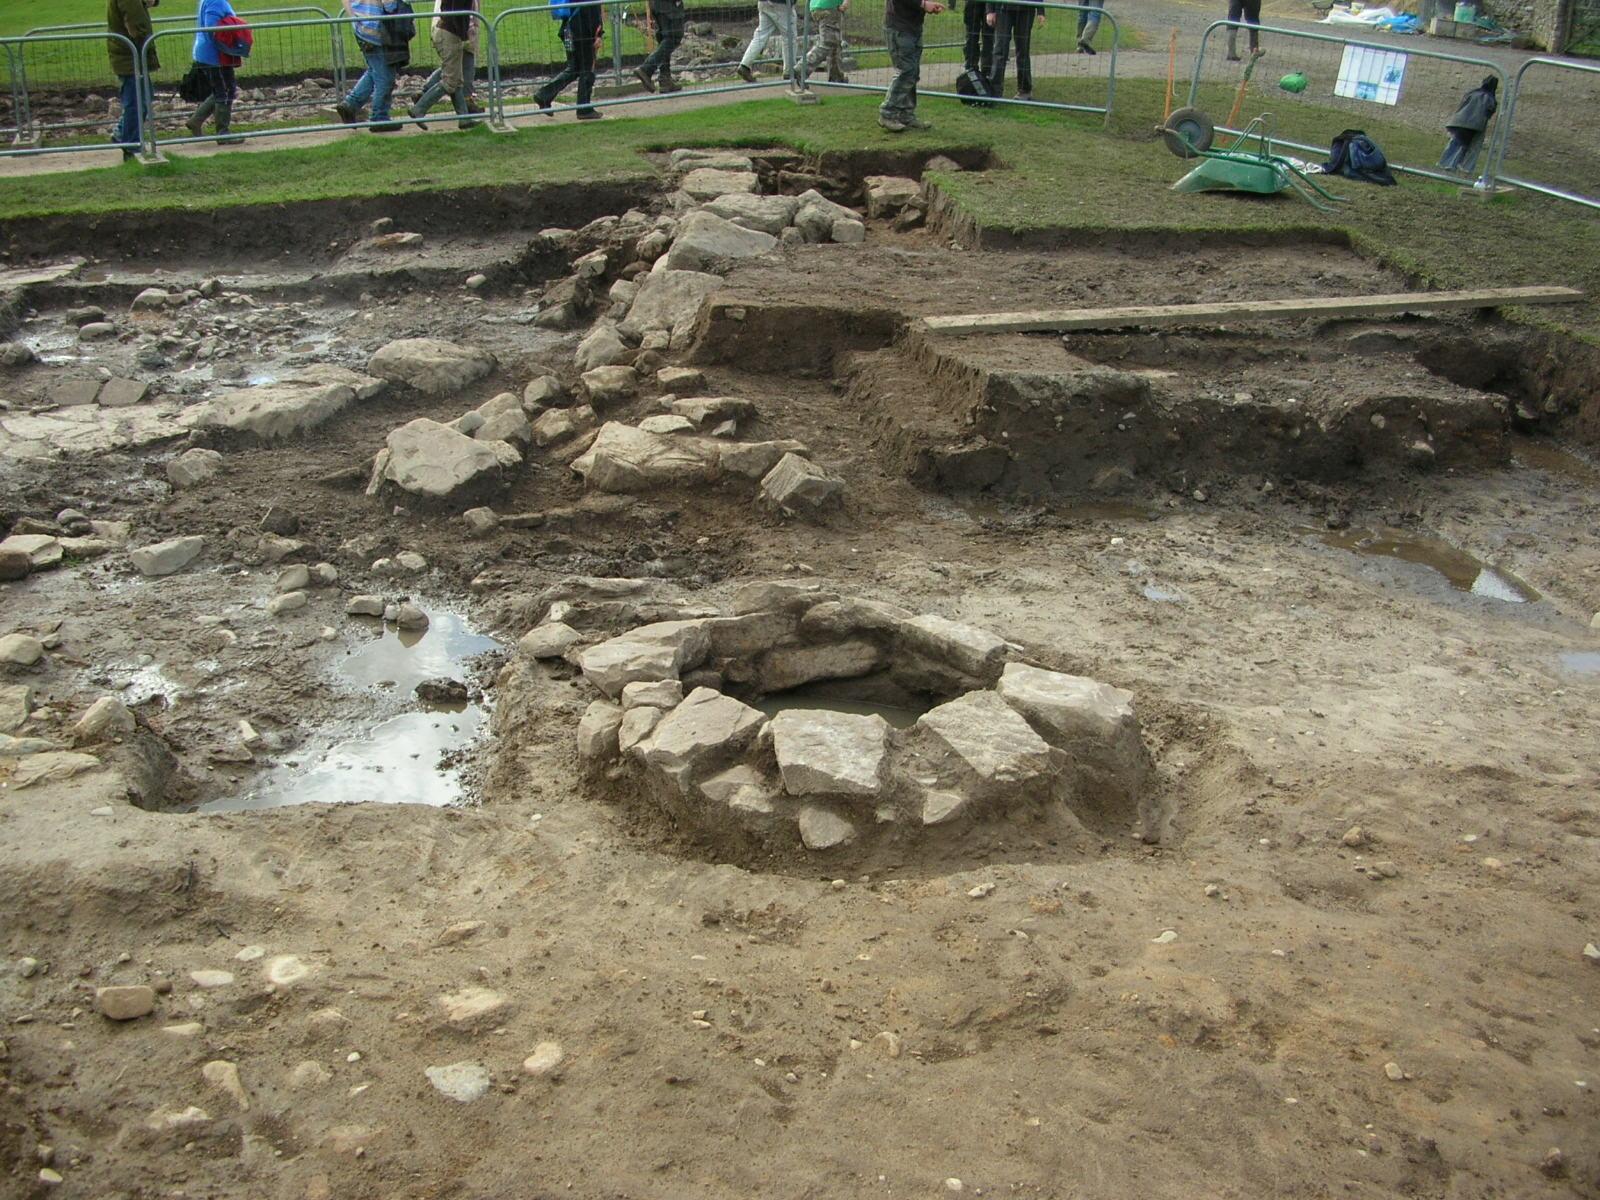 Vindolanda_2012_085.jpg